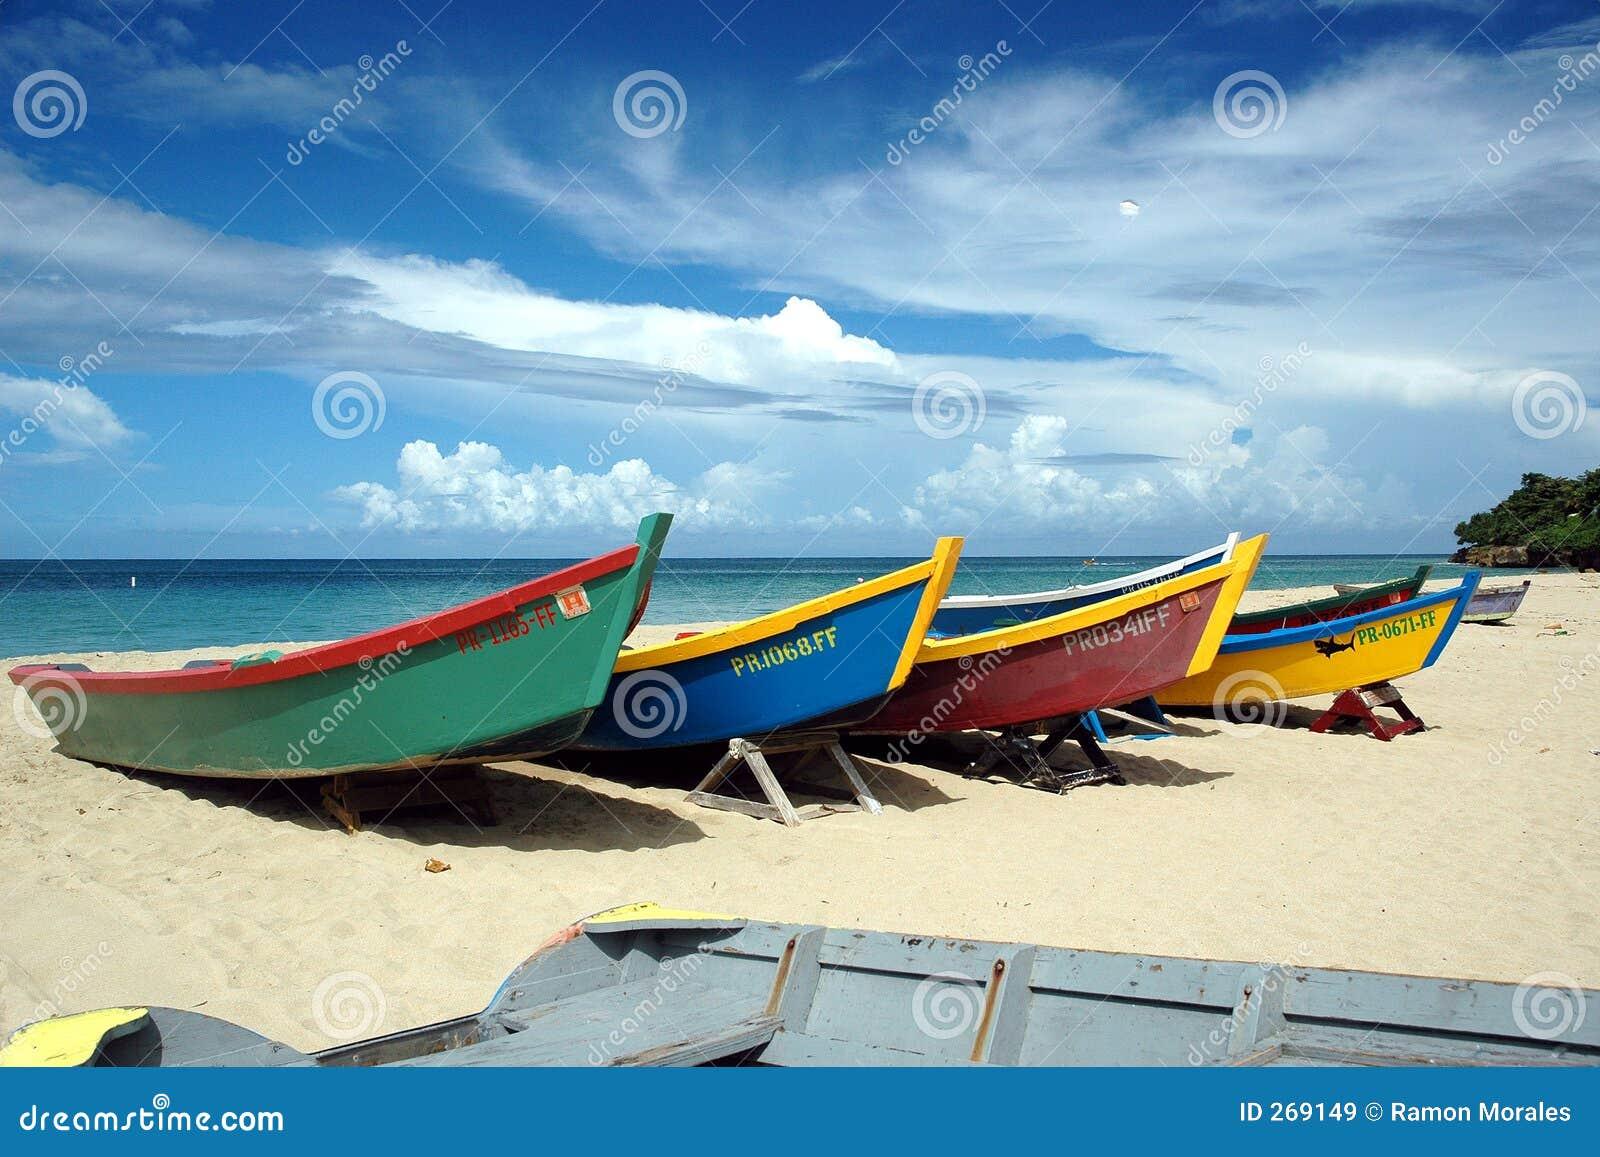 Tropical Caribbean Boats